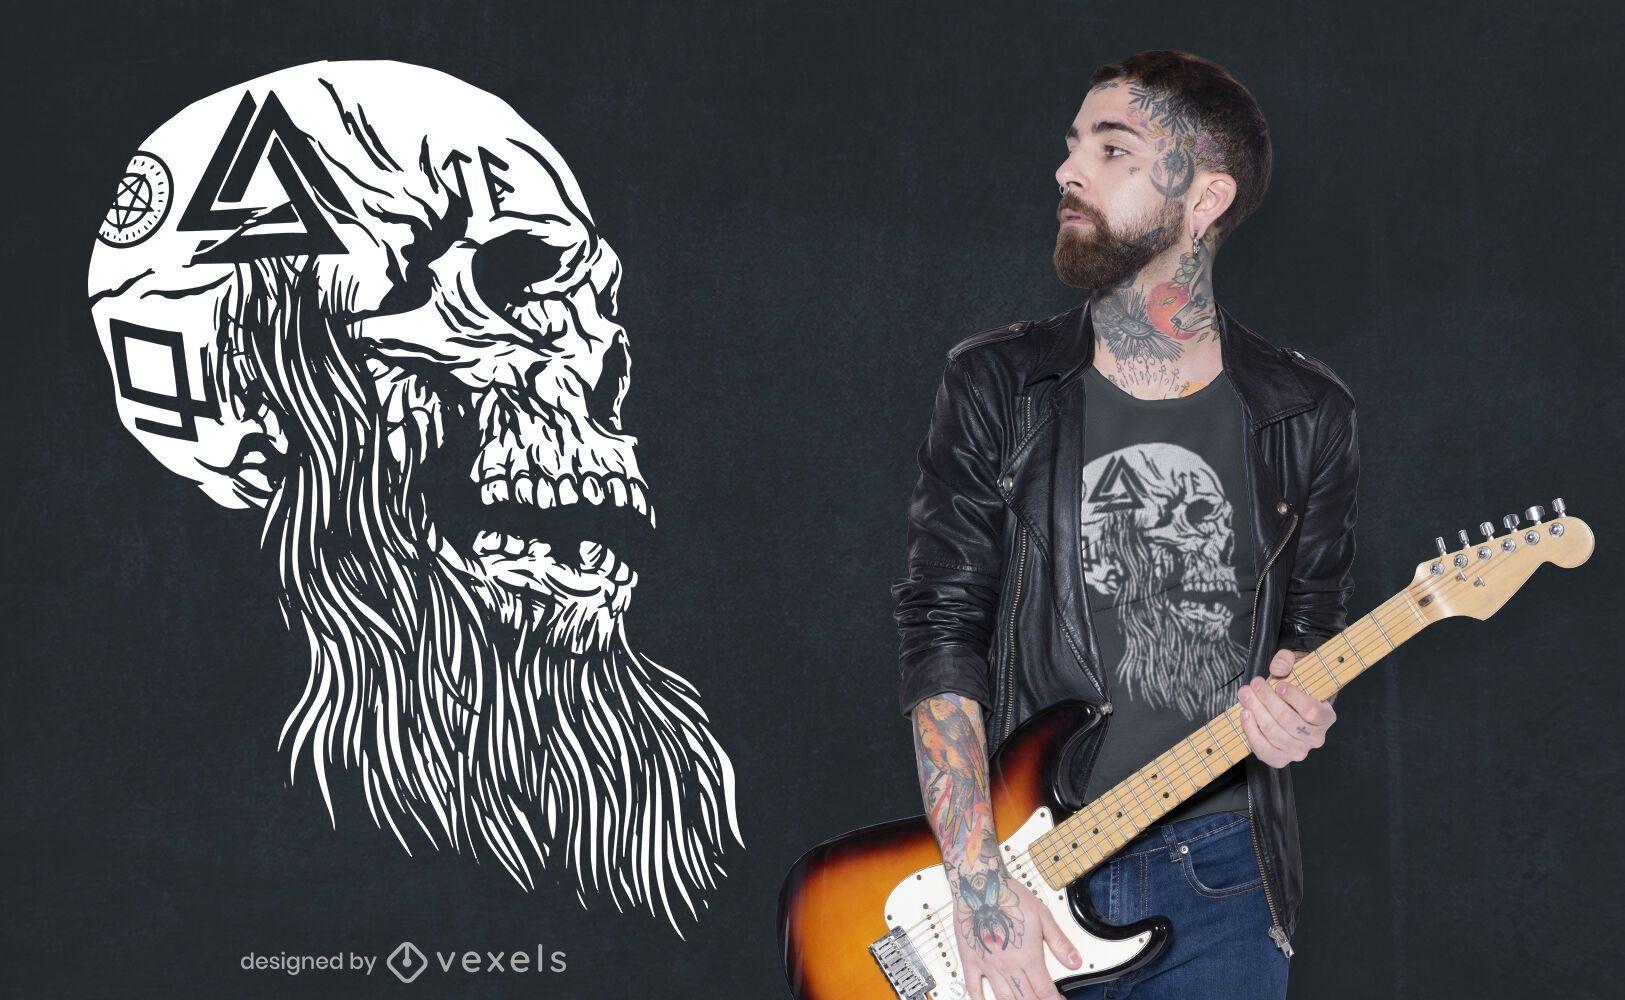 Viking tattooed skull t-shirt design